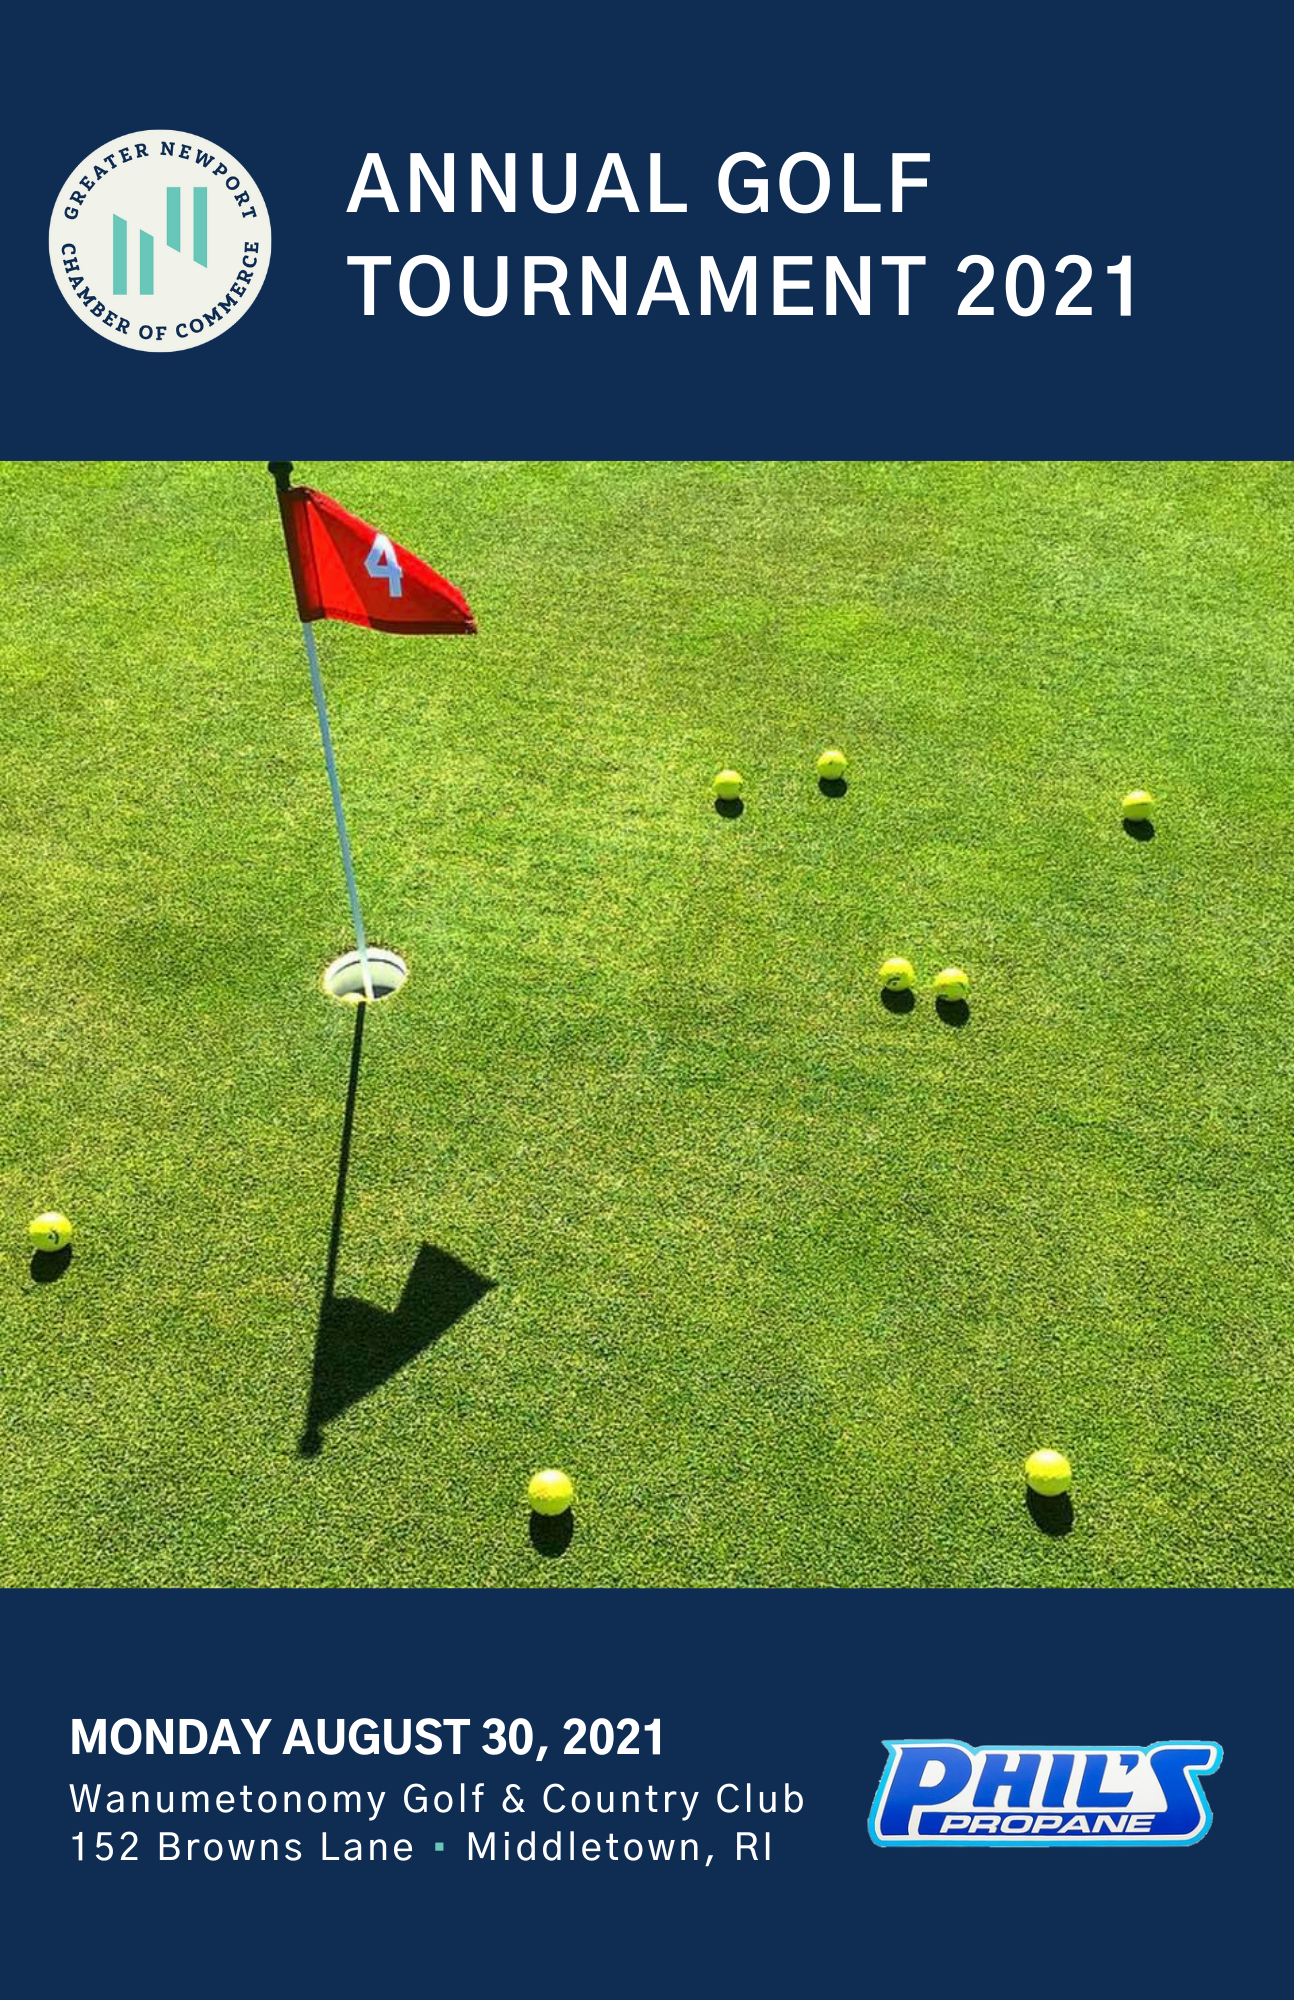 2021 Annual Golf Tournament Program